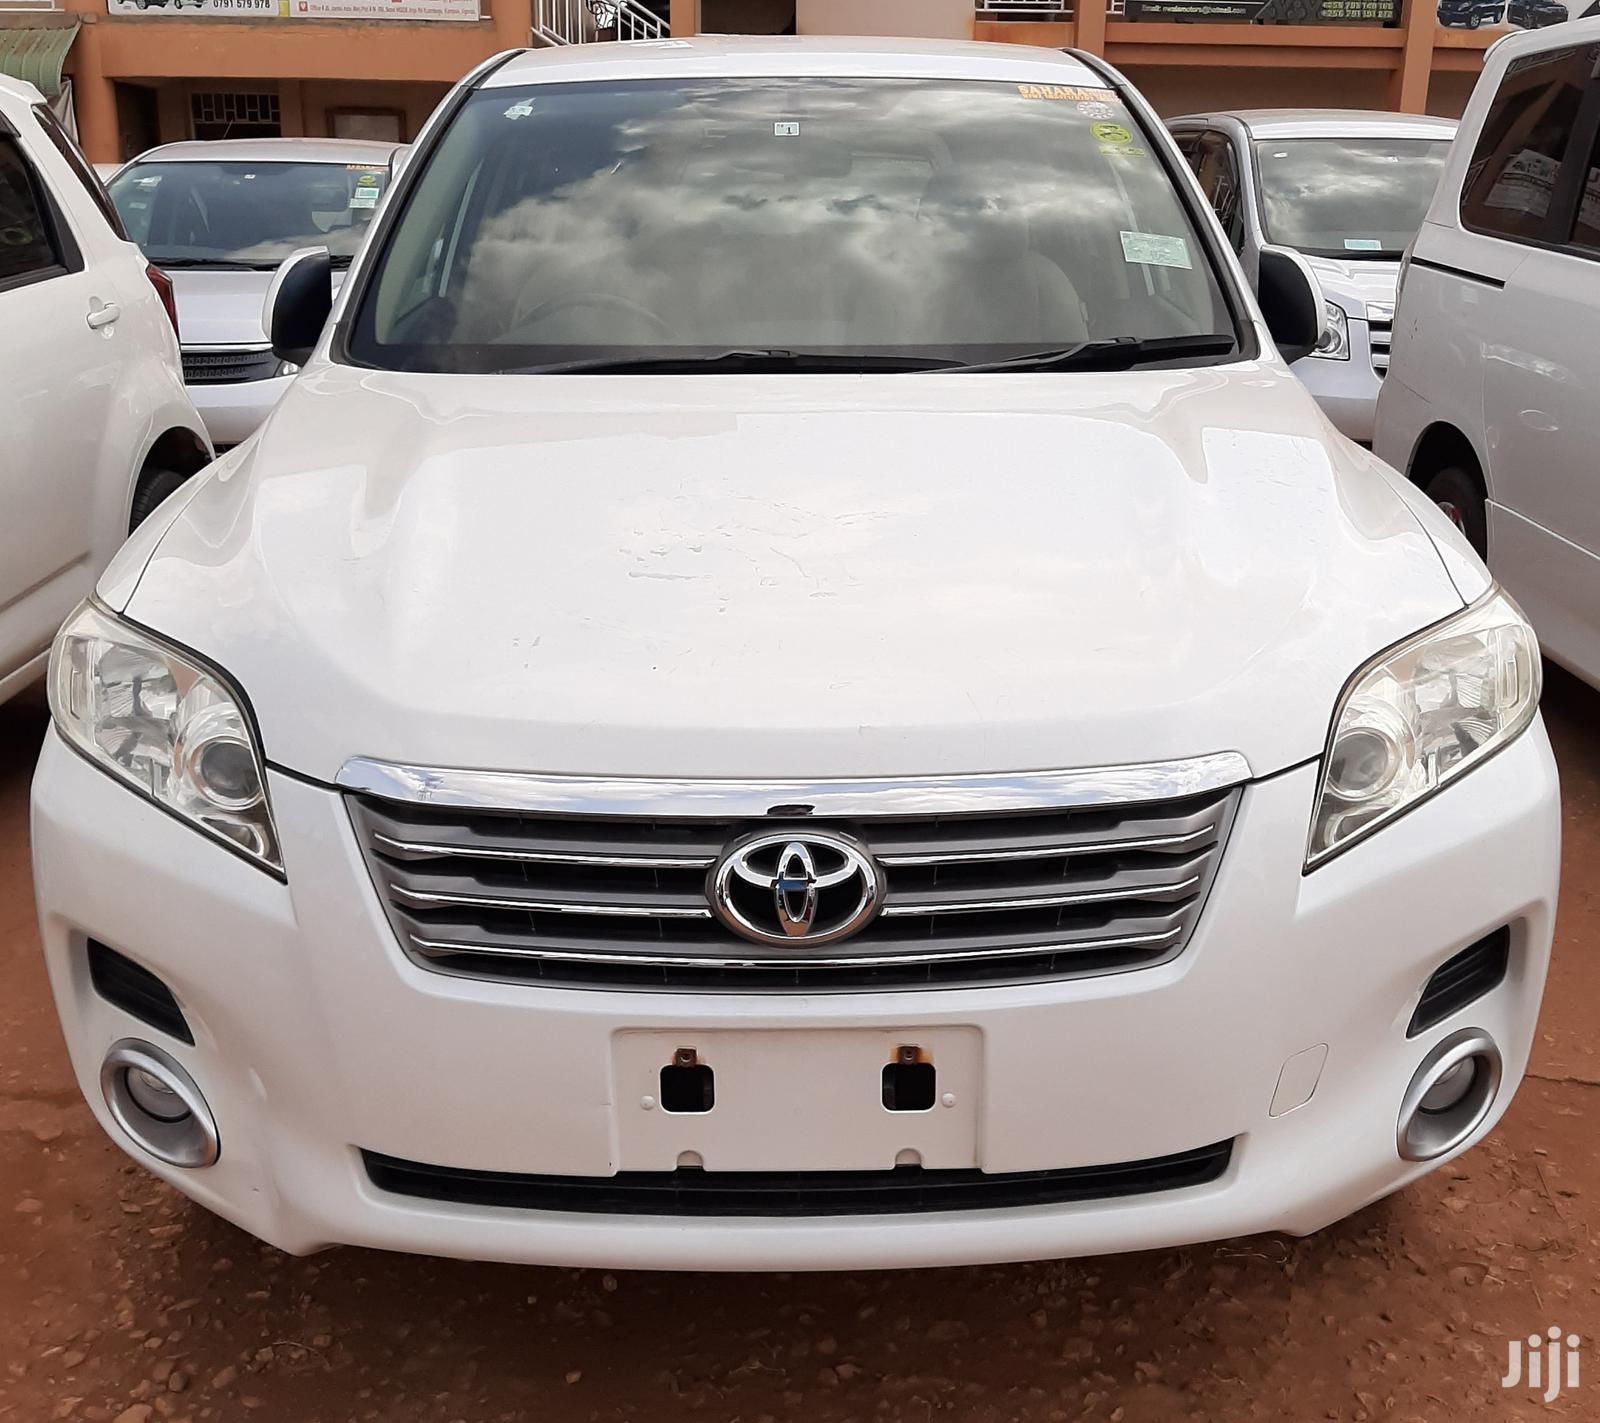 Toyota Vanguard 2007 White